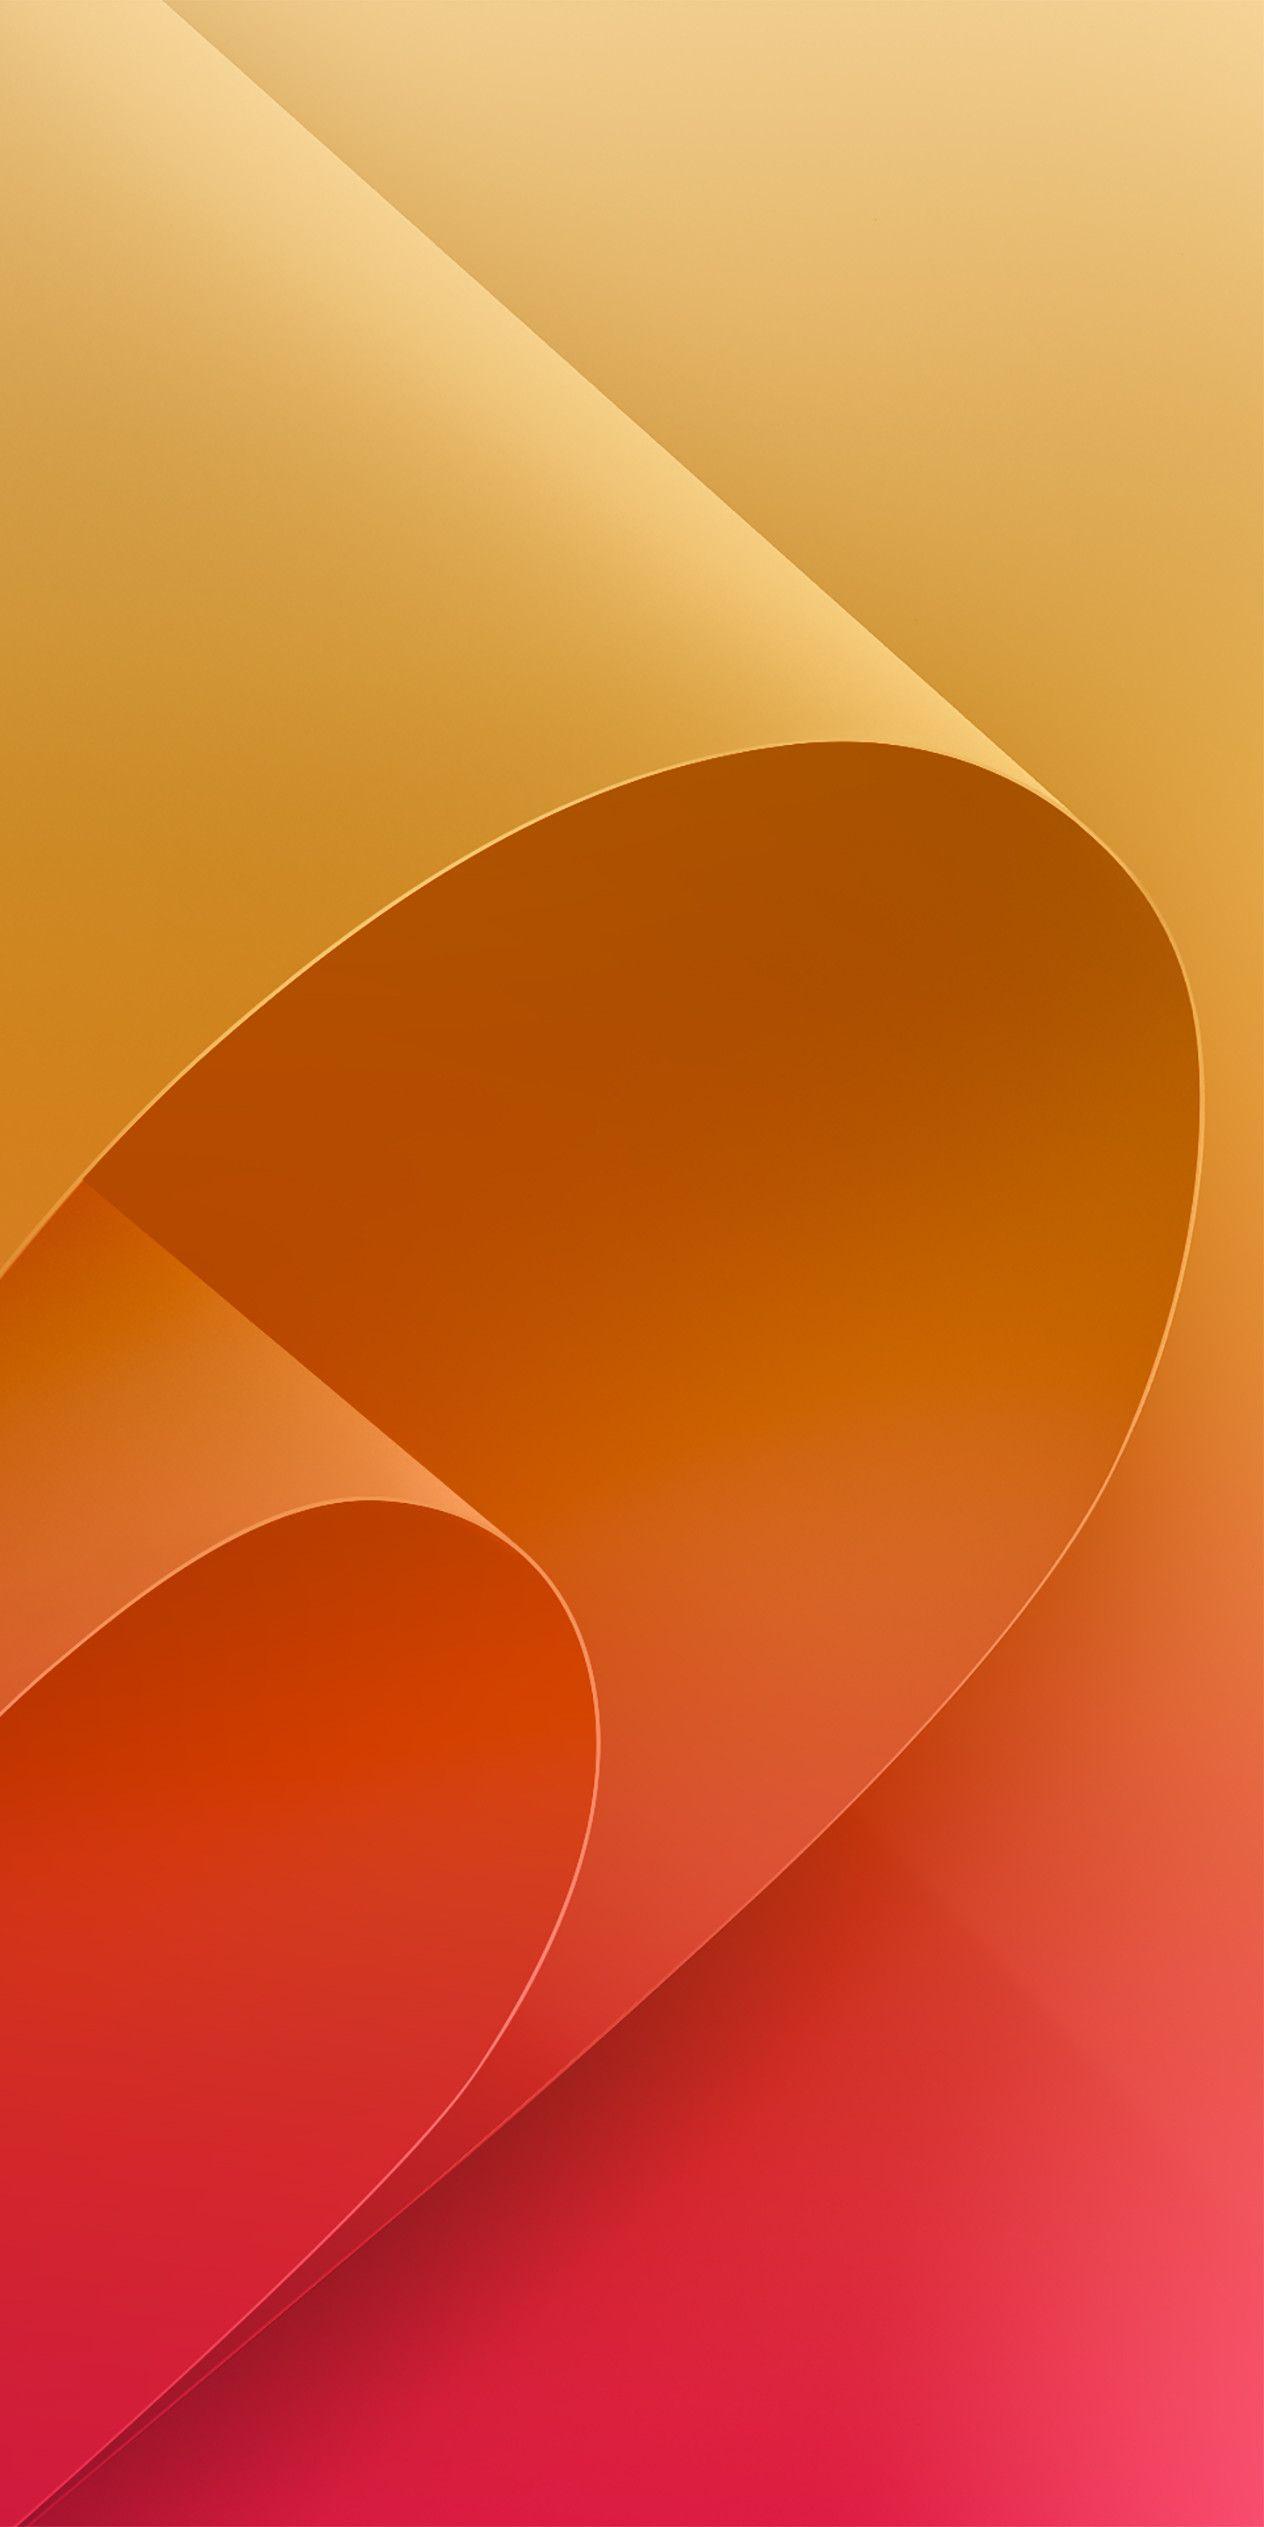 ASUS ZenFone Max Wallpapers - Wallpaper Cave